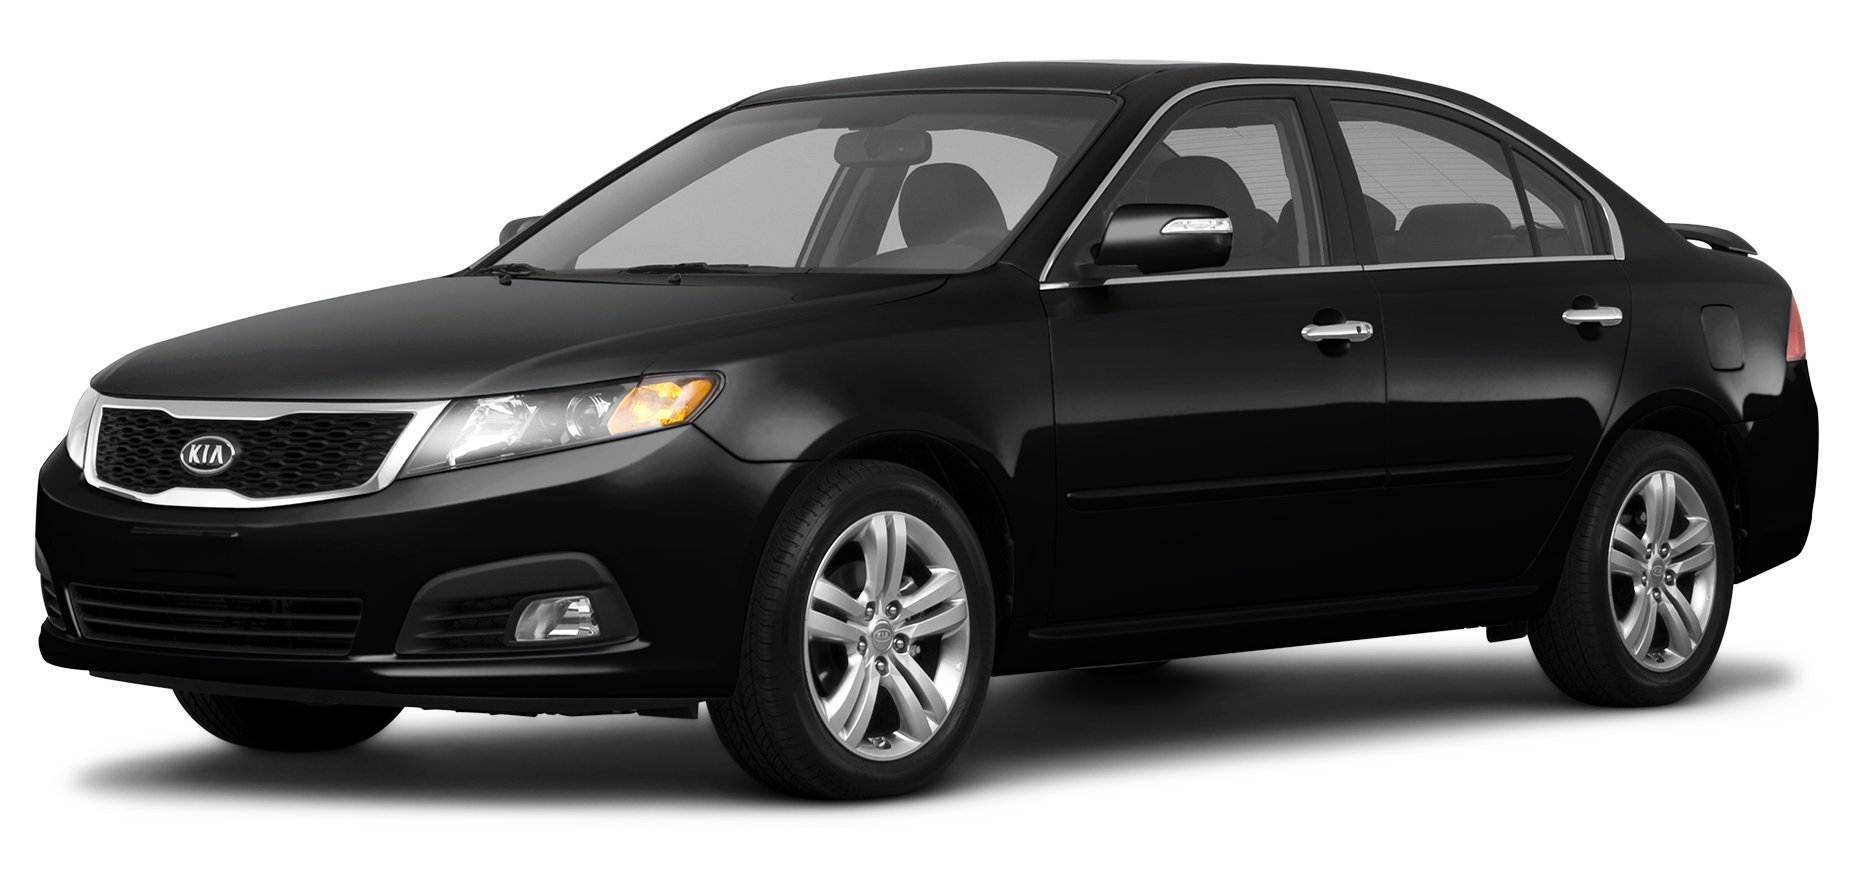 2010 kia optima ex 4 door sedan 4 cylinder automatic transmission